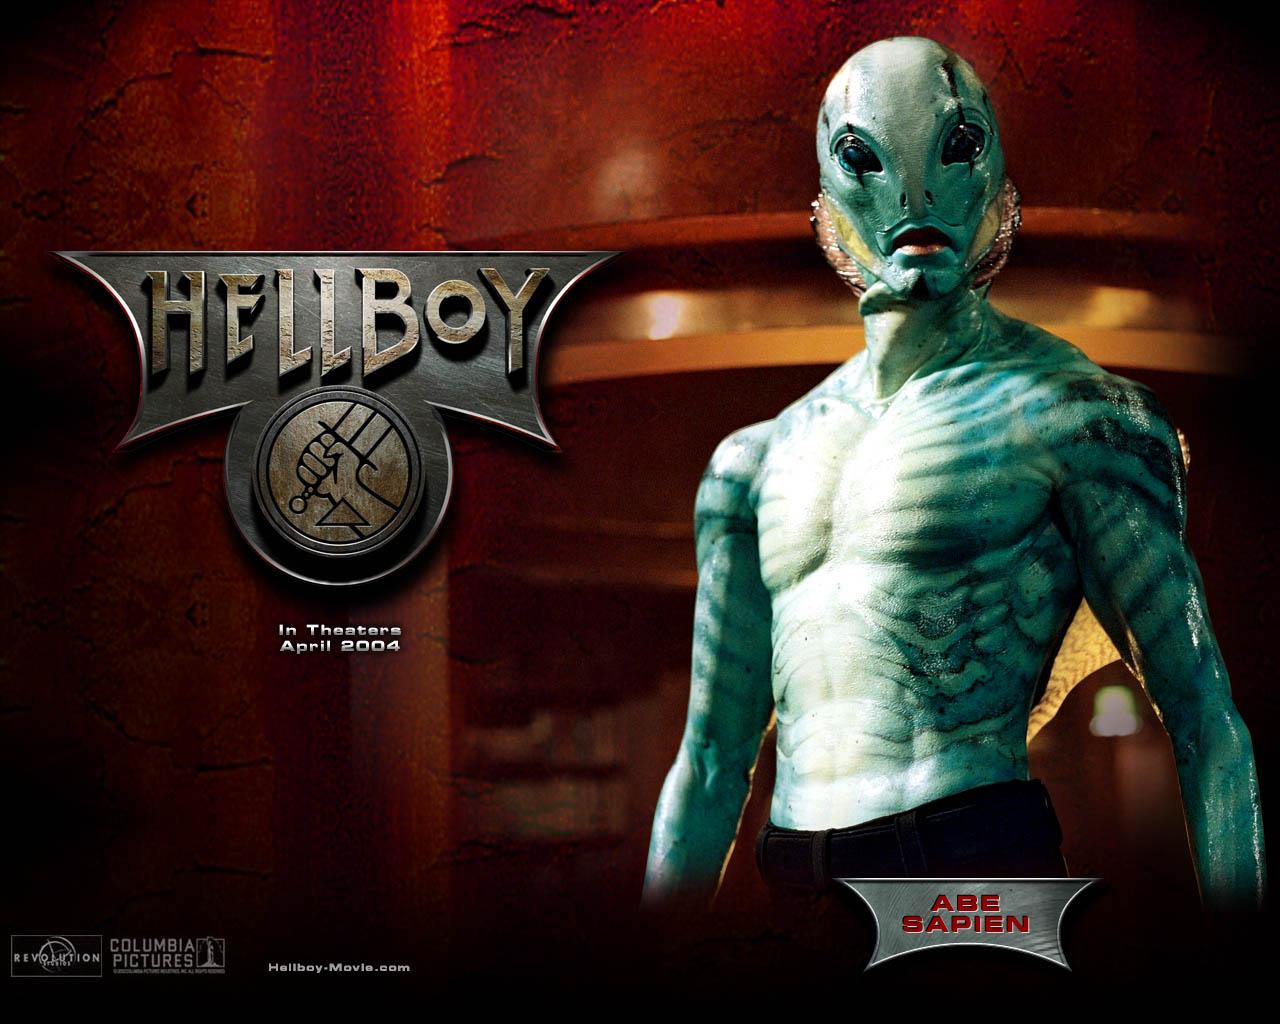 hellboy - photo #18